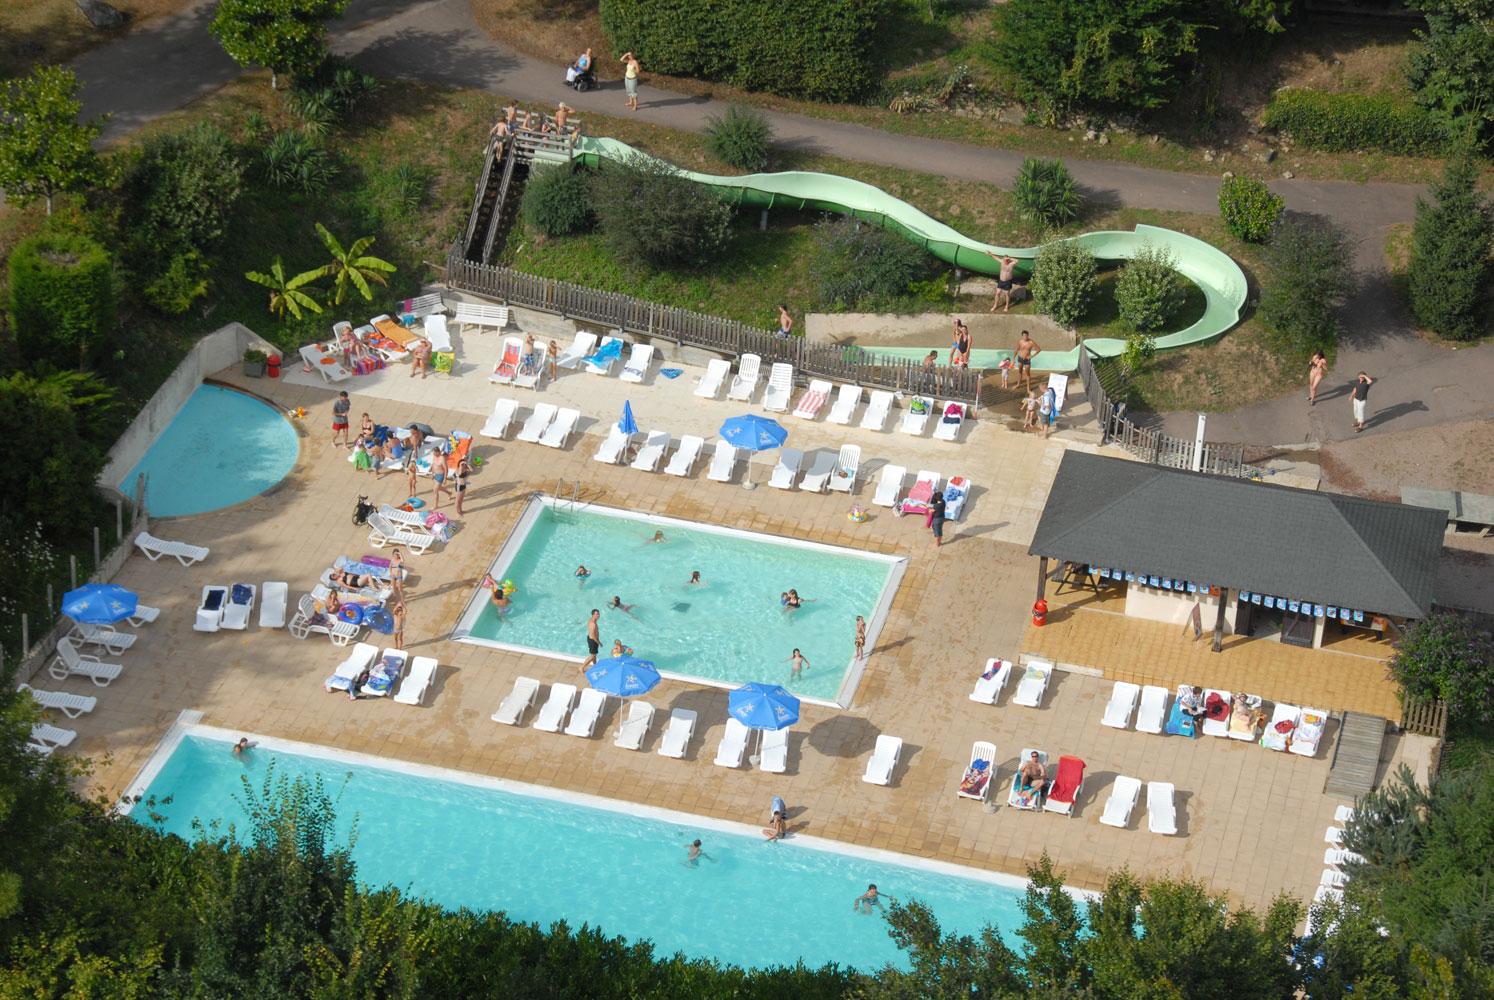 L 39 eau piscine chauff e toboggan et tangs au camping for Camping dordogne avec piscine et toboggan